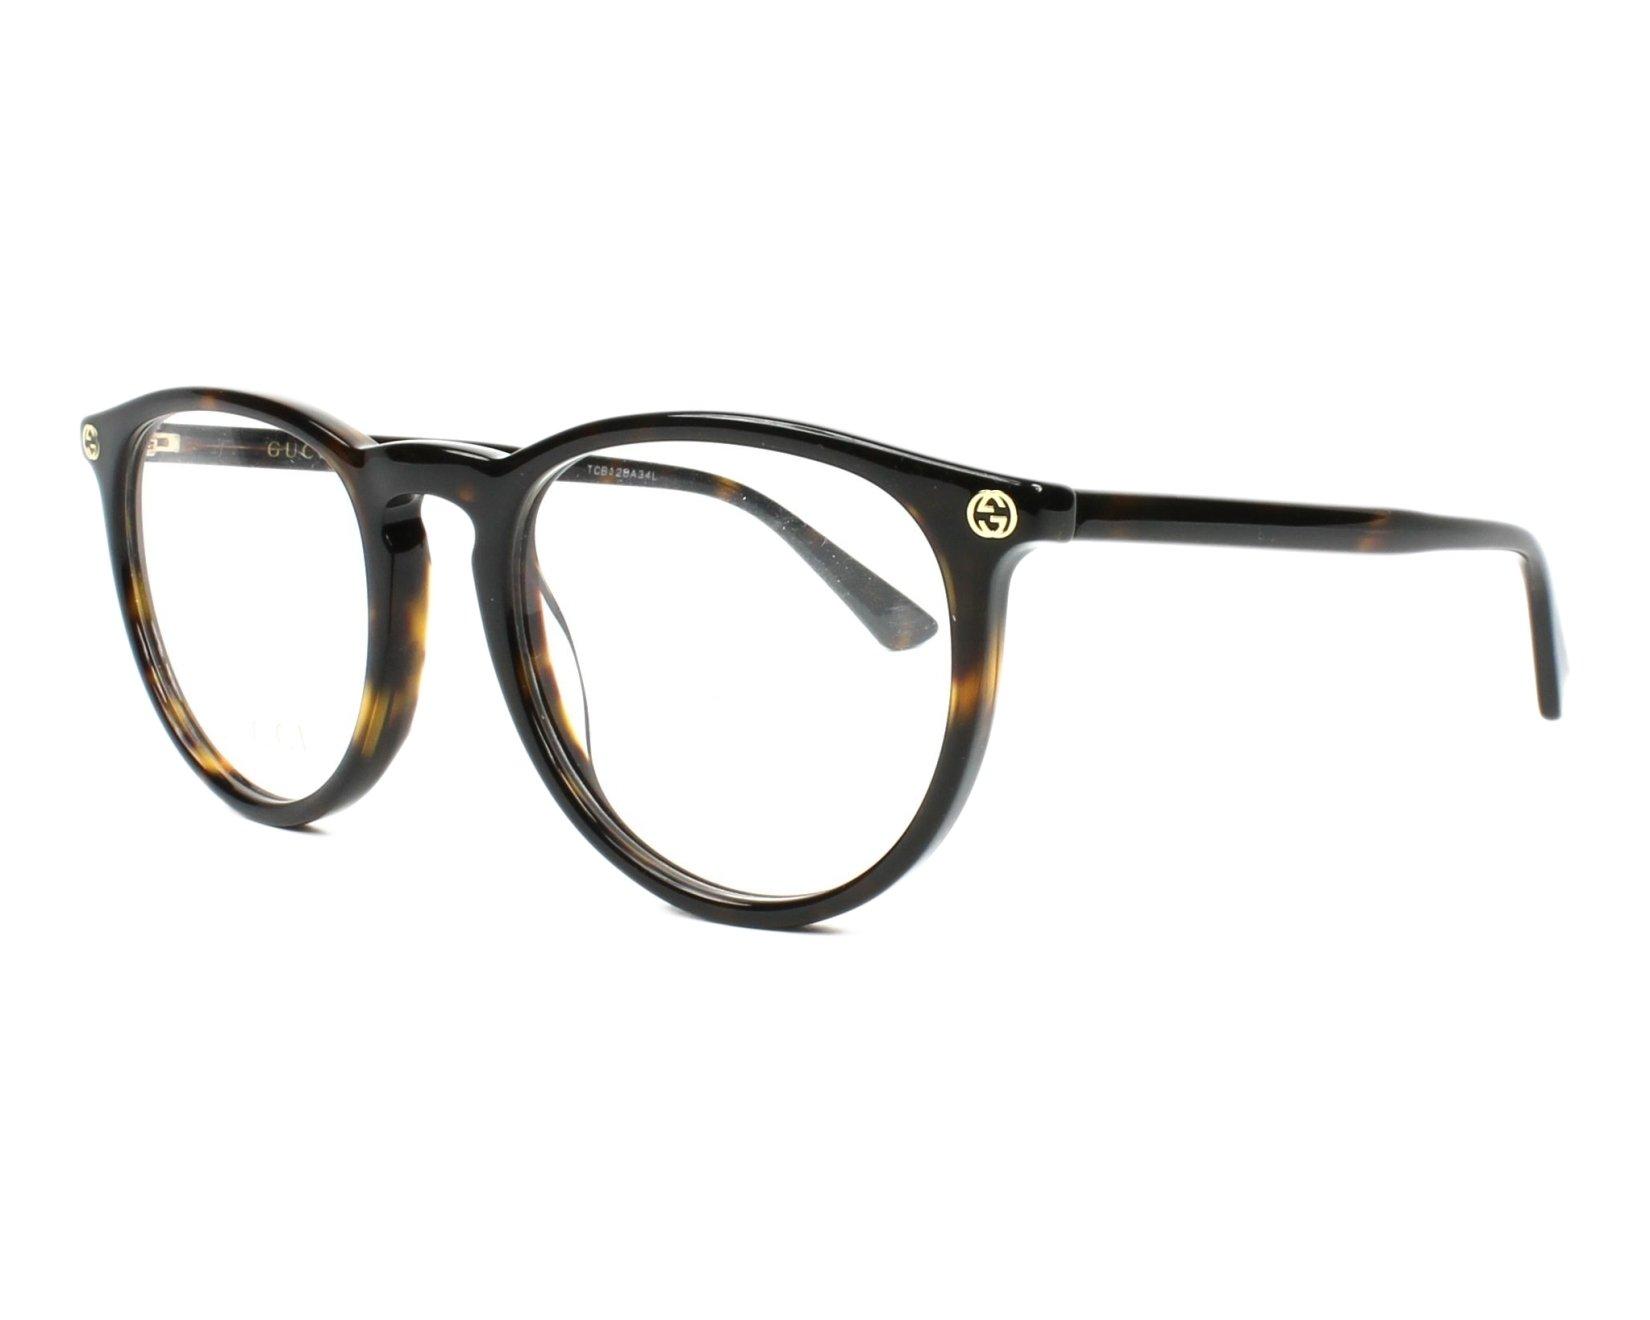 184a0b3d7 Galleon - Gucci Women's Gg0027o 50Mm Optical Glasses